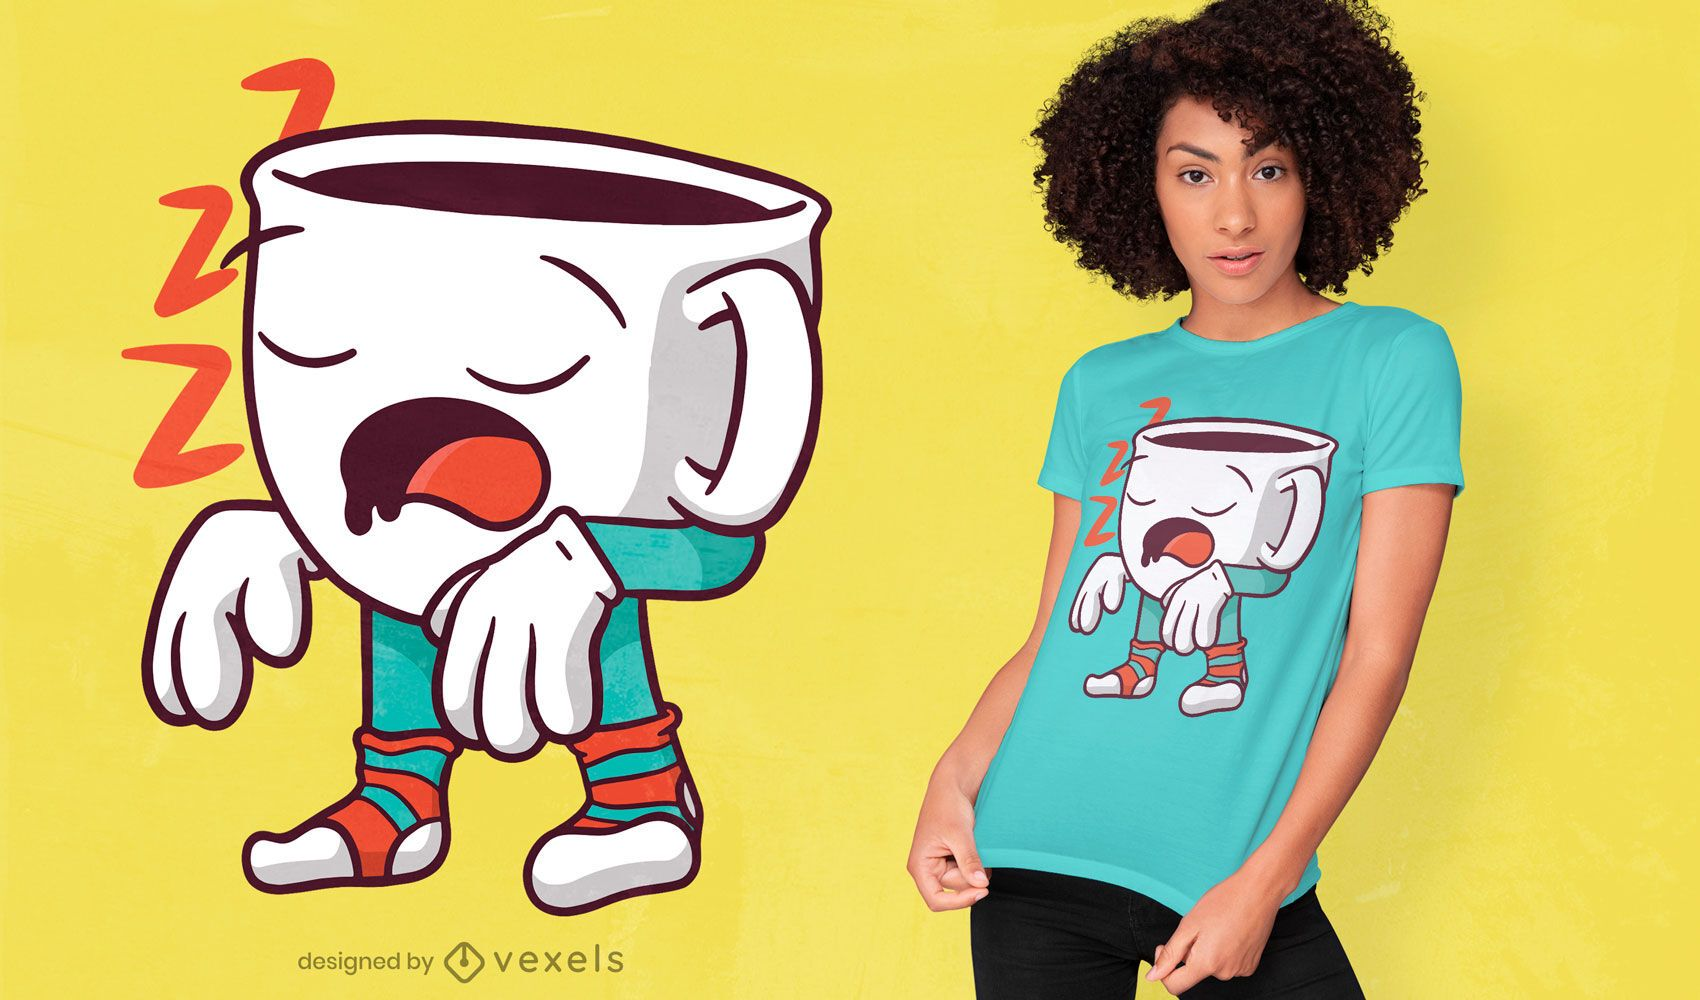 Sleepwalking coffee cup t-shirt design